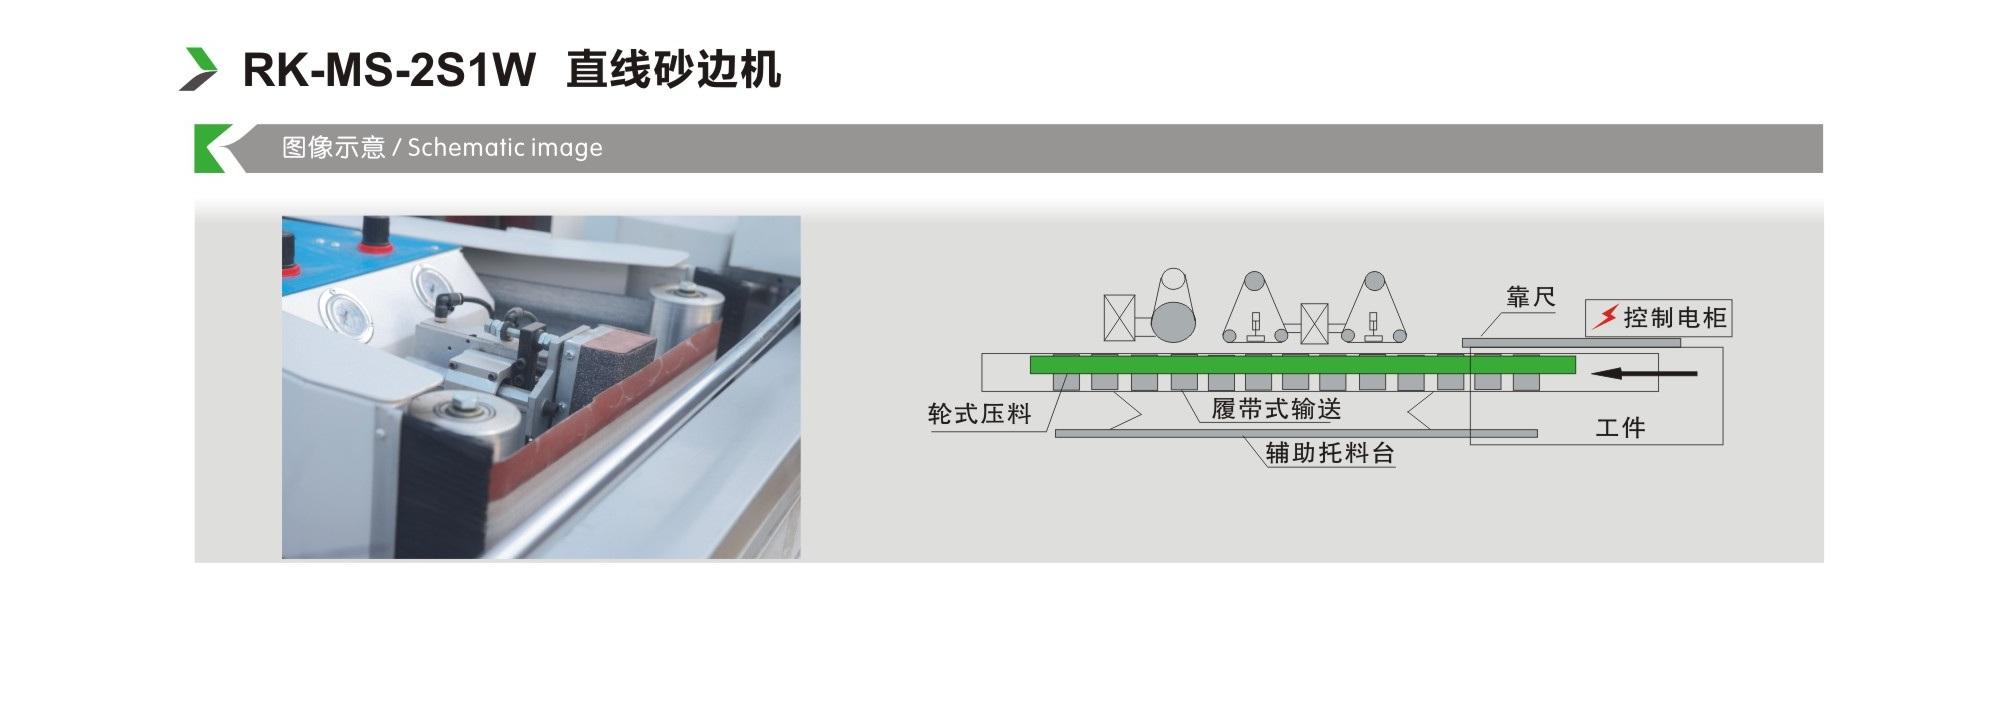 Muwei super tough sliding miter saw wholesale for frozen food processing plants-3